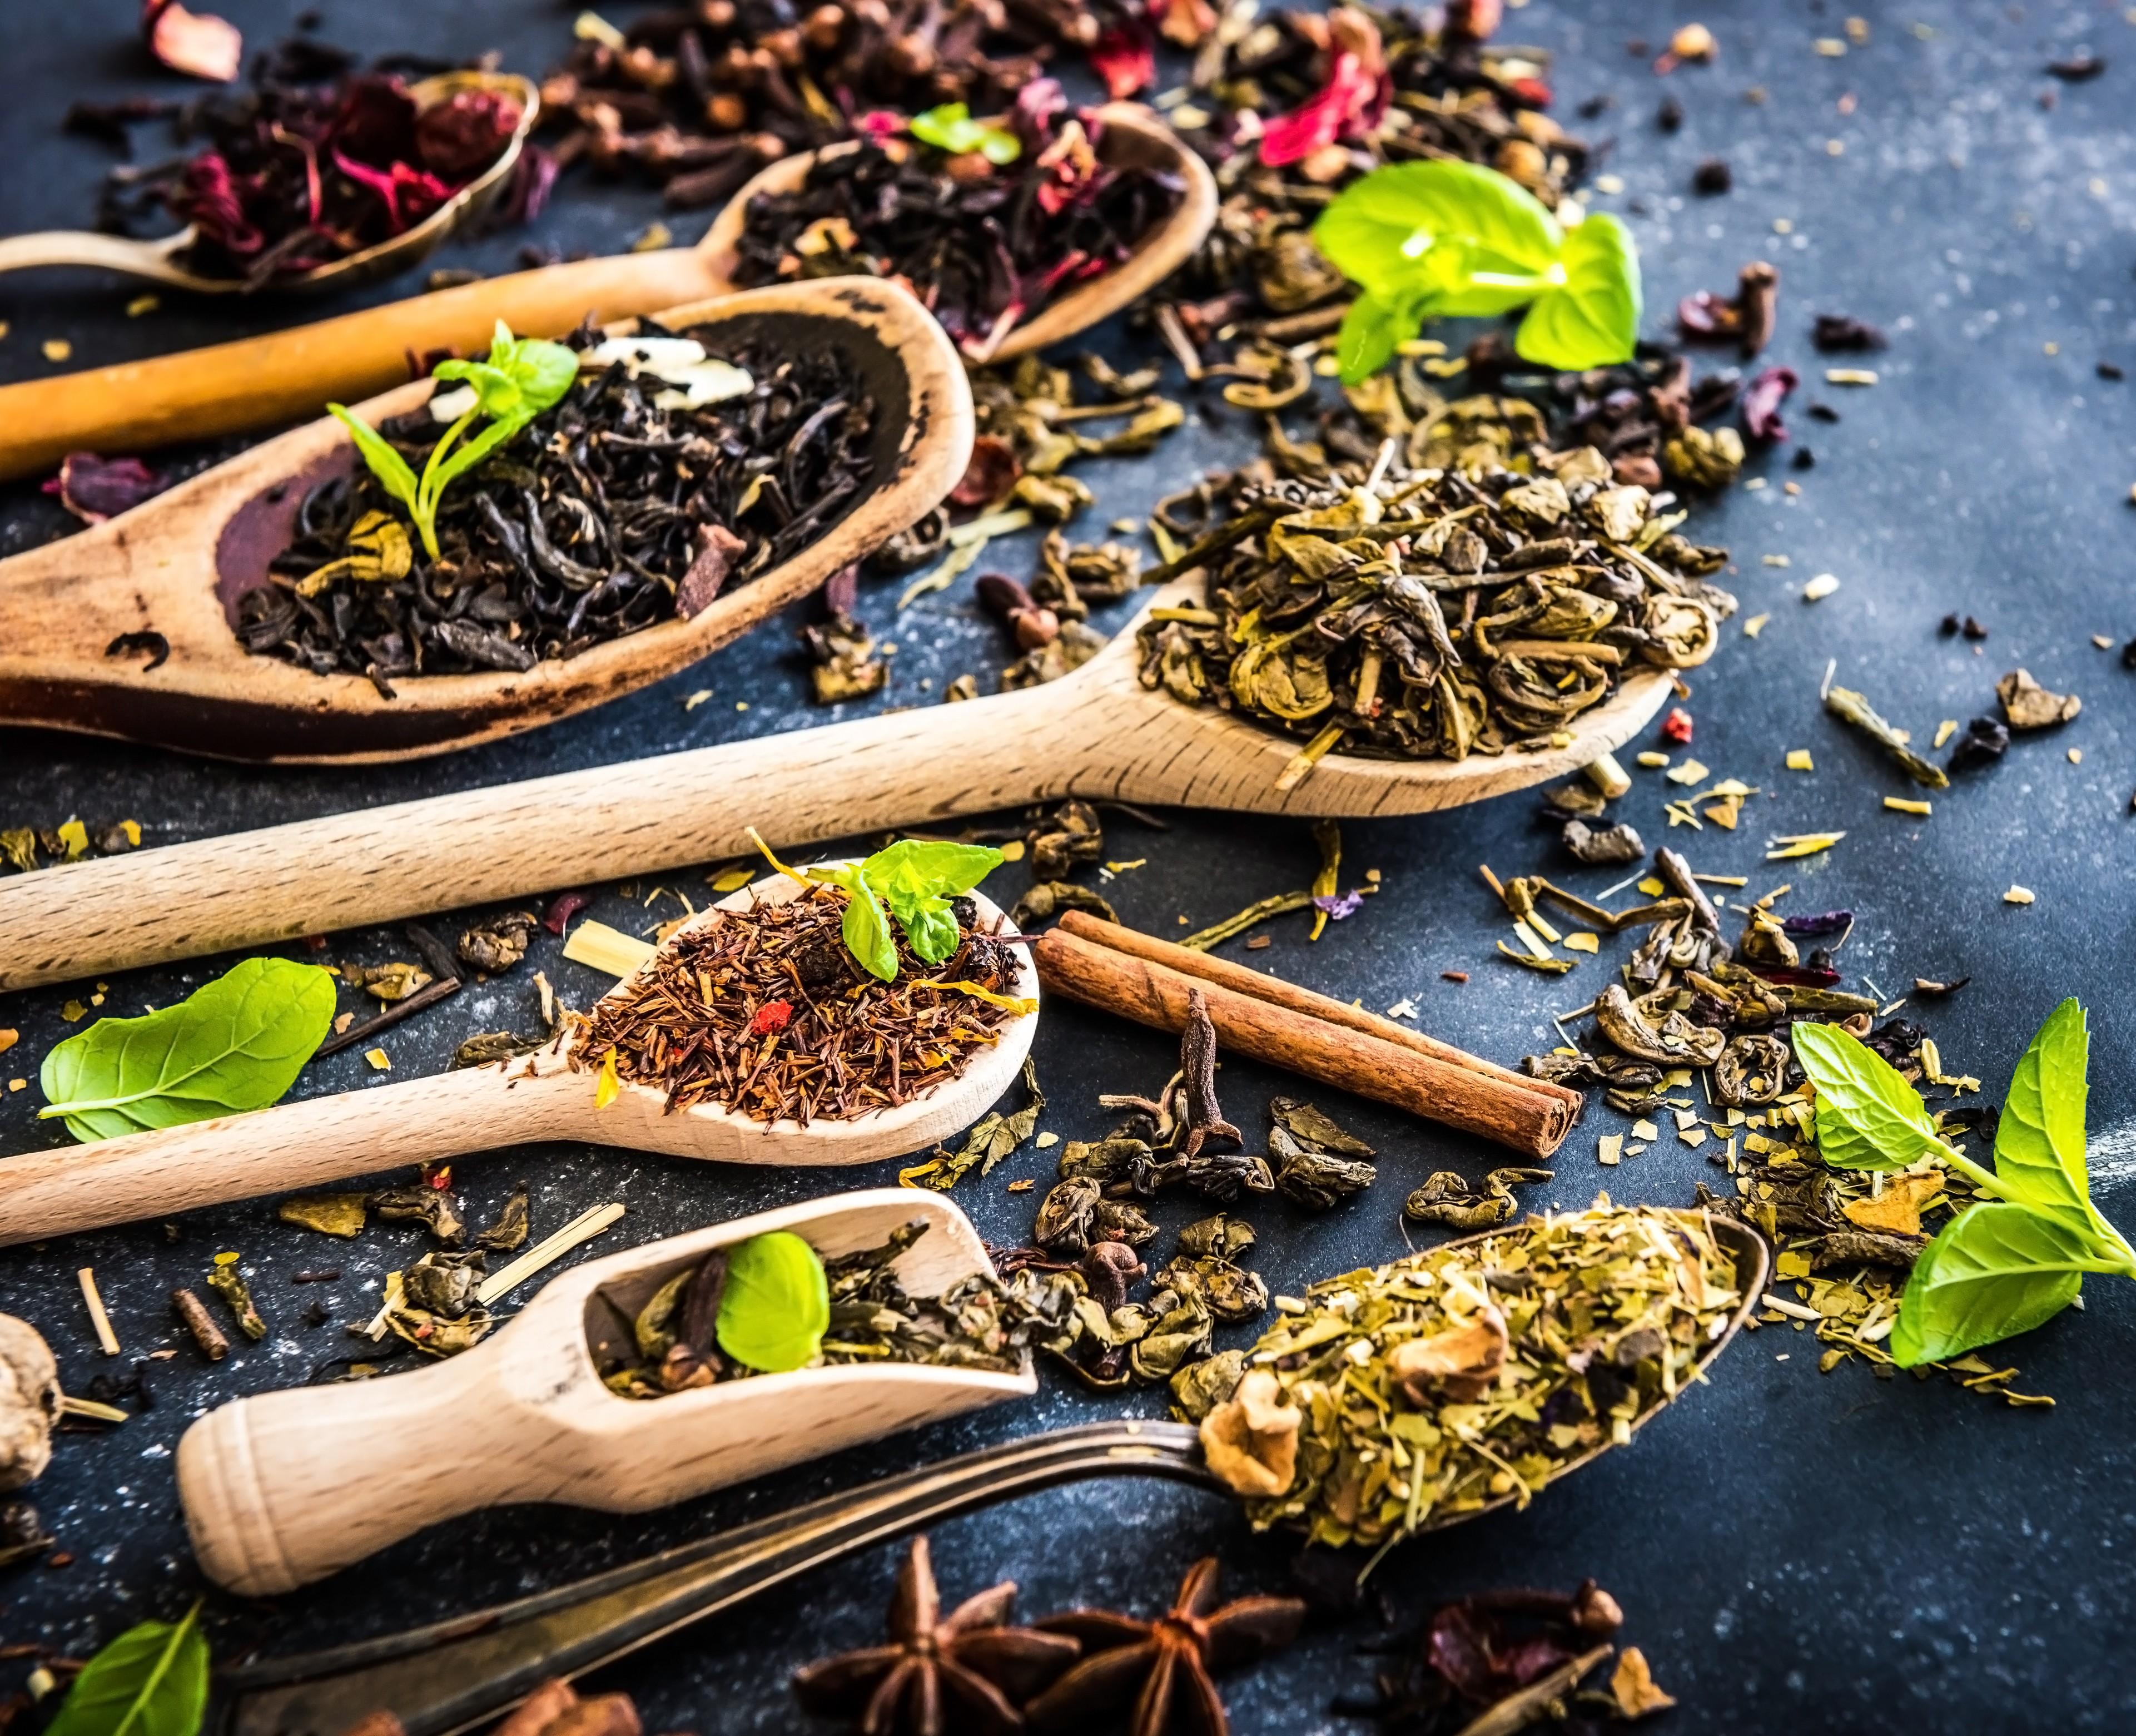 Os melhores chás para enxugar a barriga (Foto: Thinkstock)